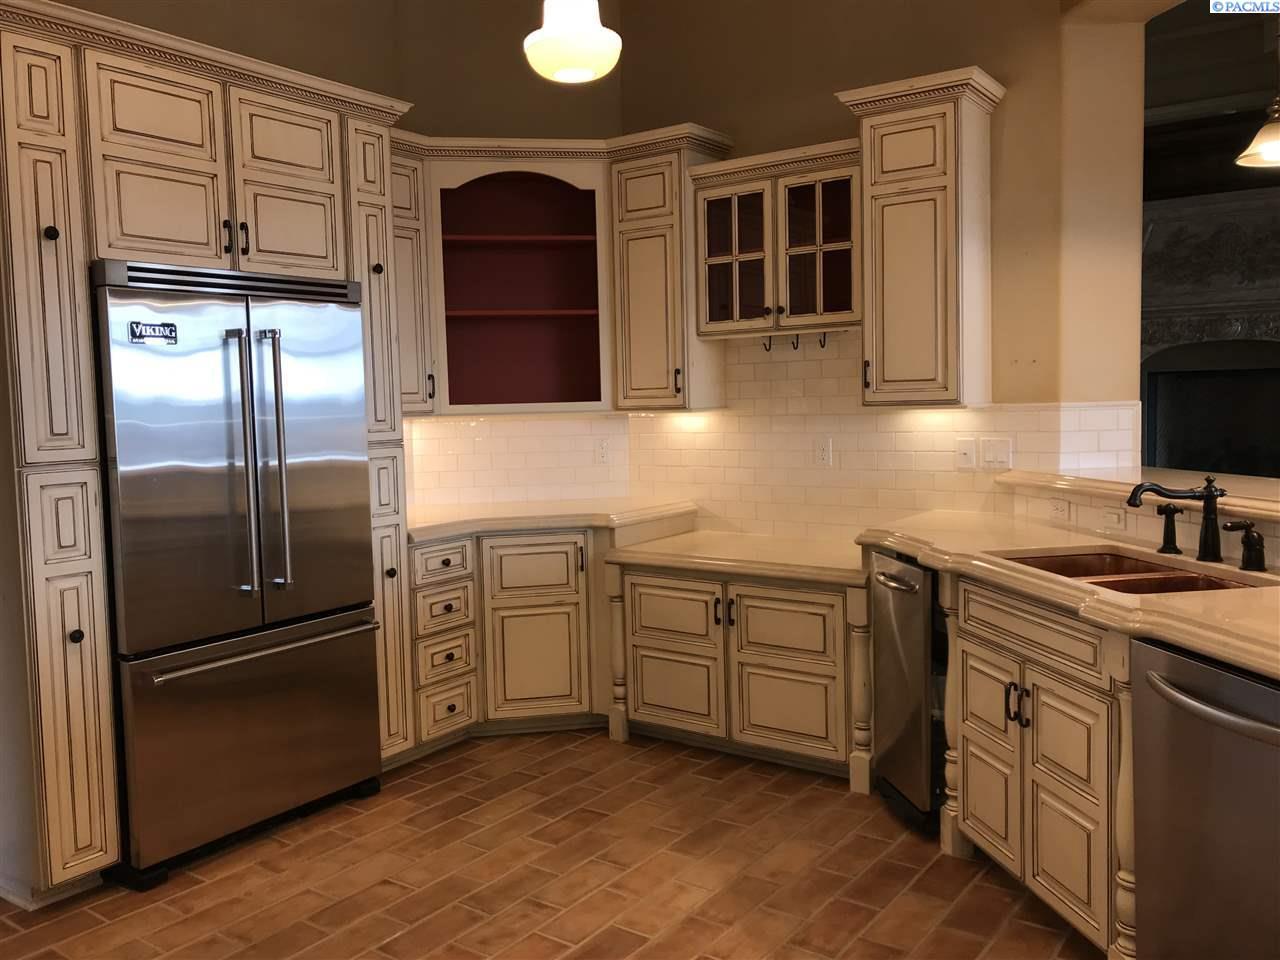 Additional photo for property listing at 3077 Riverbend Dr. 3077 Riverbend Dr. Richland, Washington 99354 United States